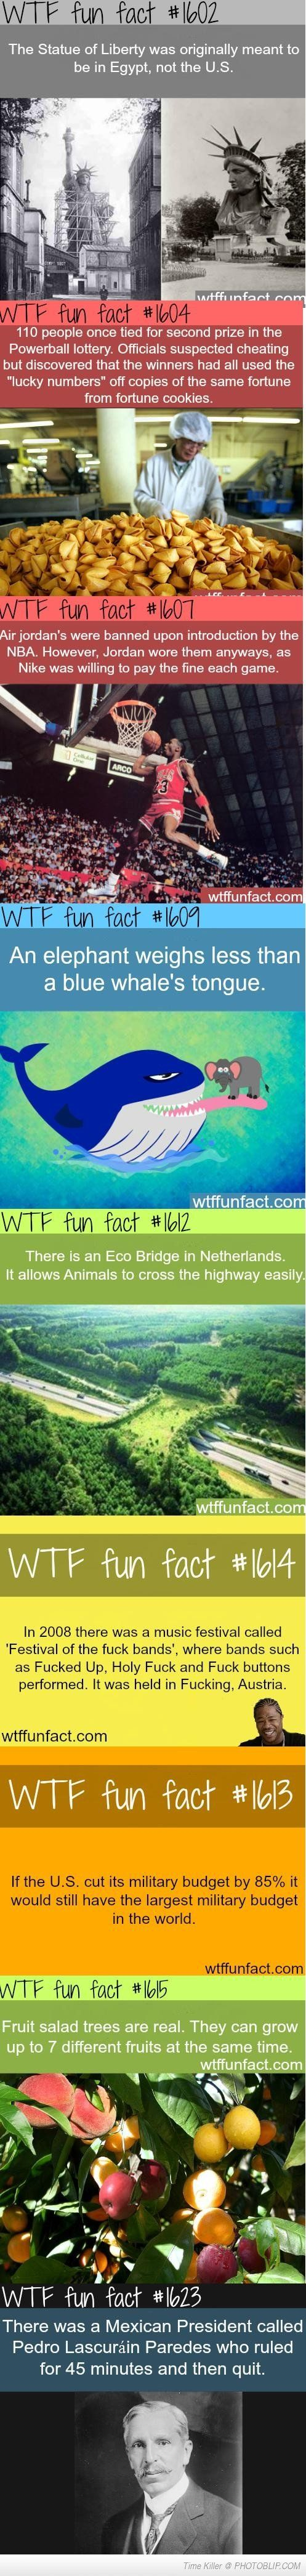 Amazing facts!!! Mind blown